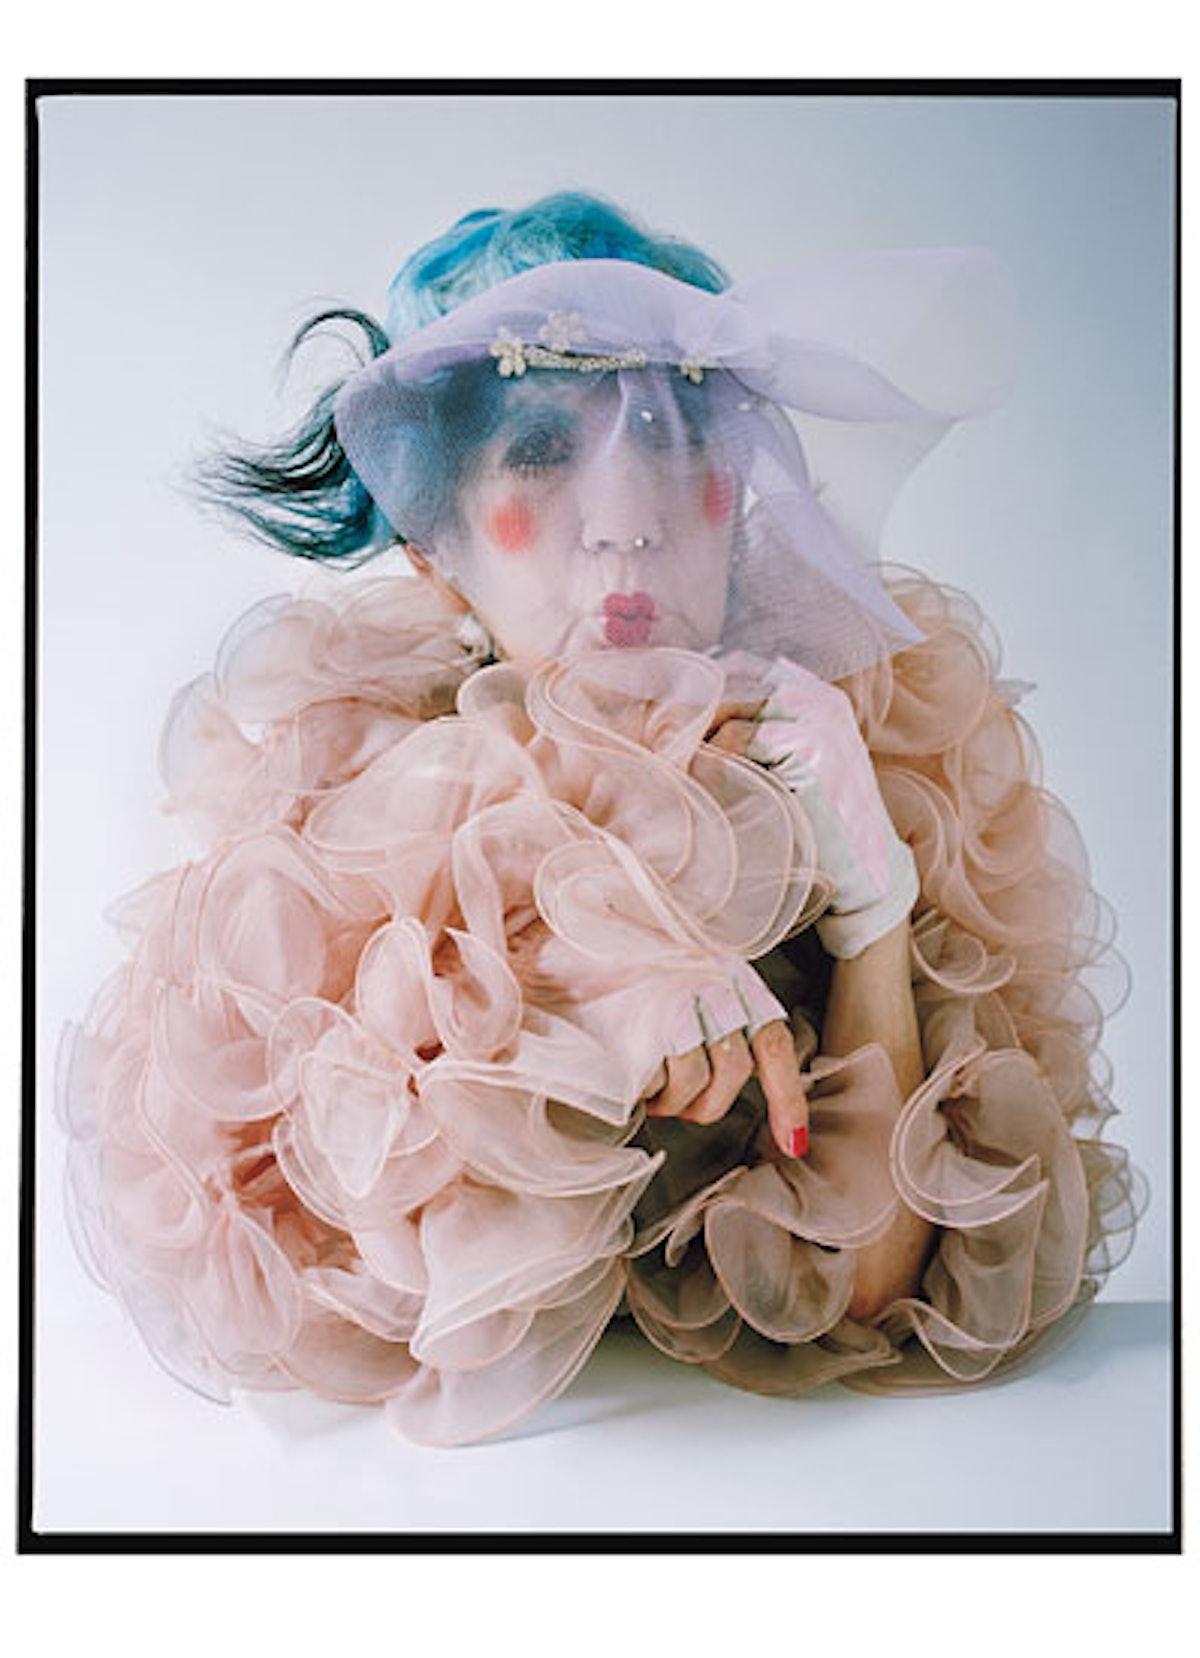 fass-anna-piaggi-fashion-icon-01-v.jpg